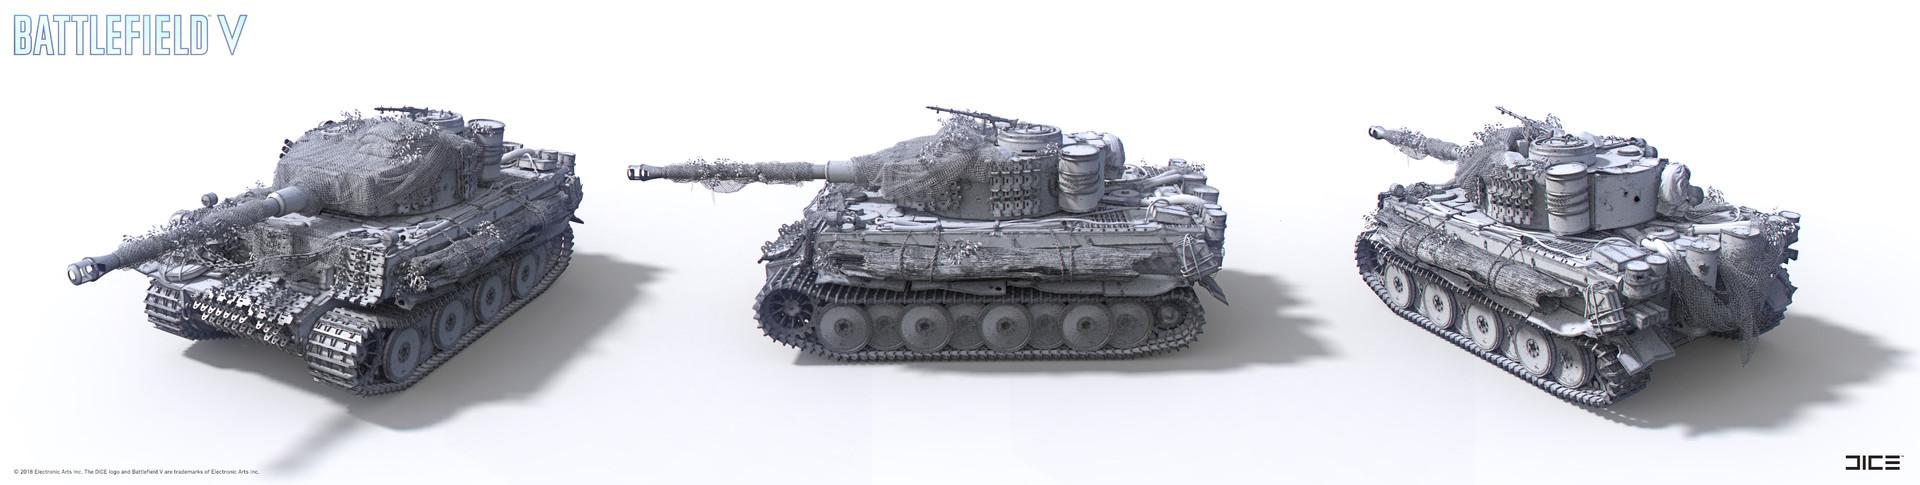 """Battlefield V"" - The Last Tiger - Final Concept Sculpture turntable"